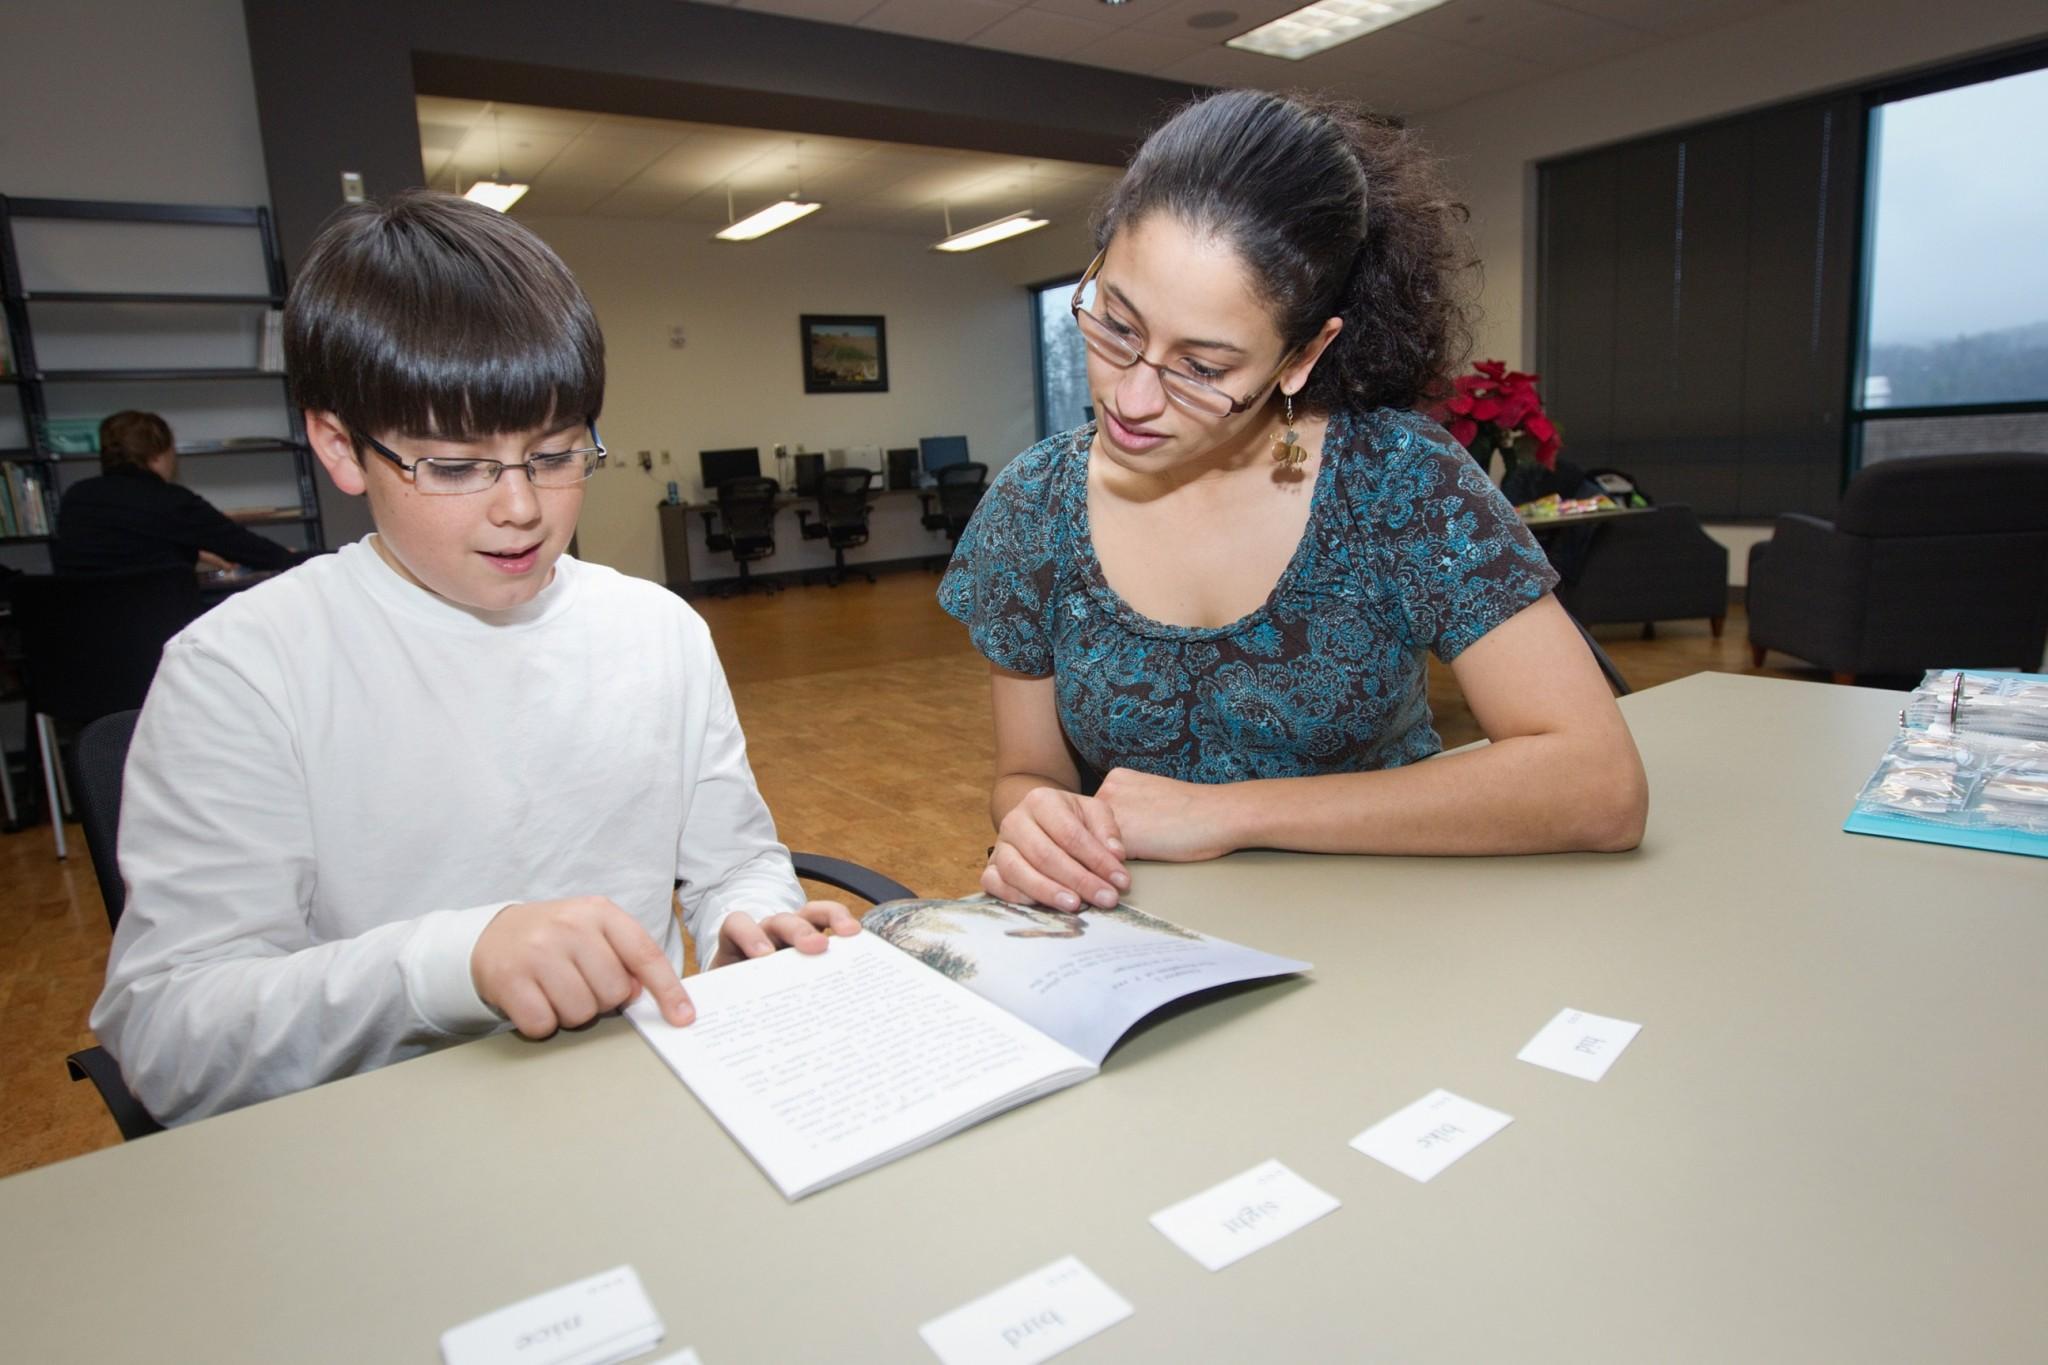 Reading+clinic+tutors+children%2C+provides+experience